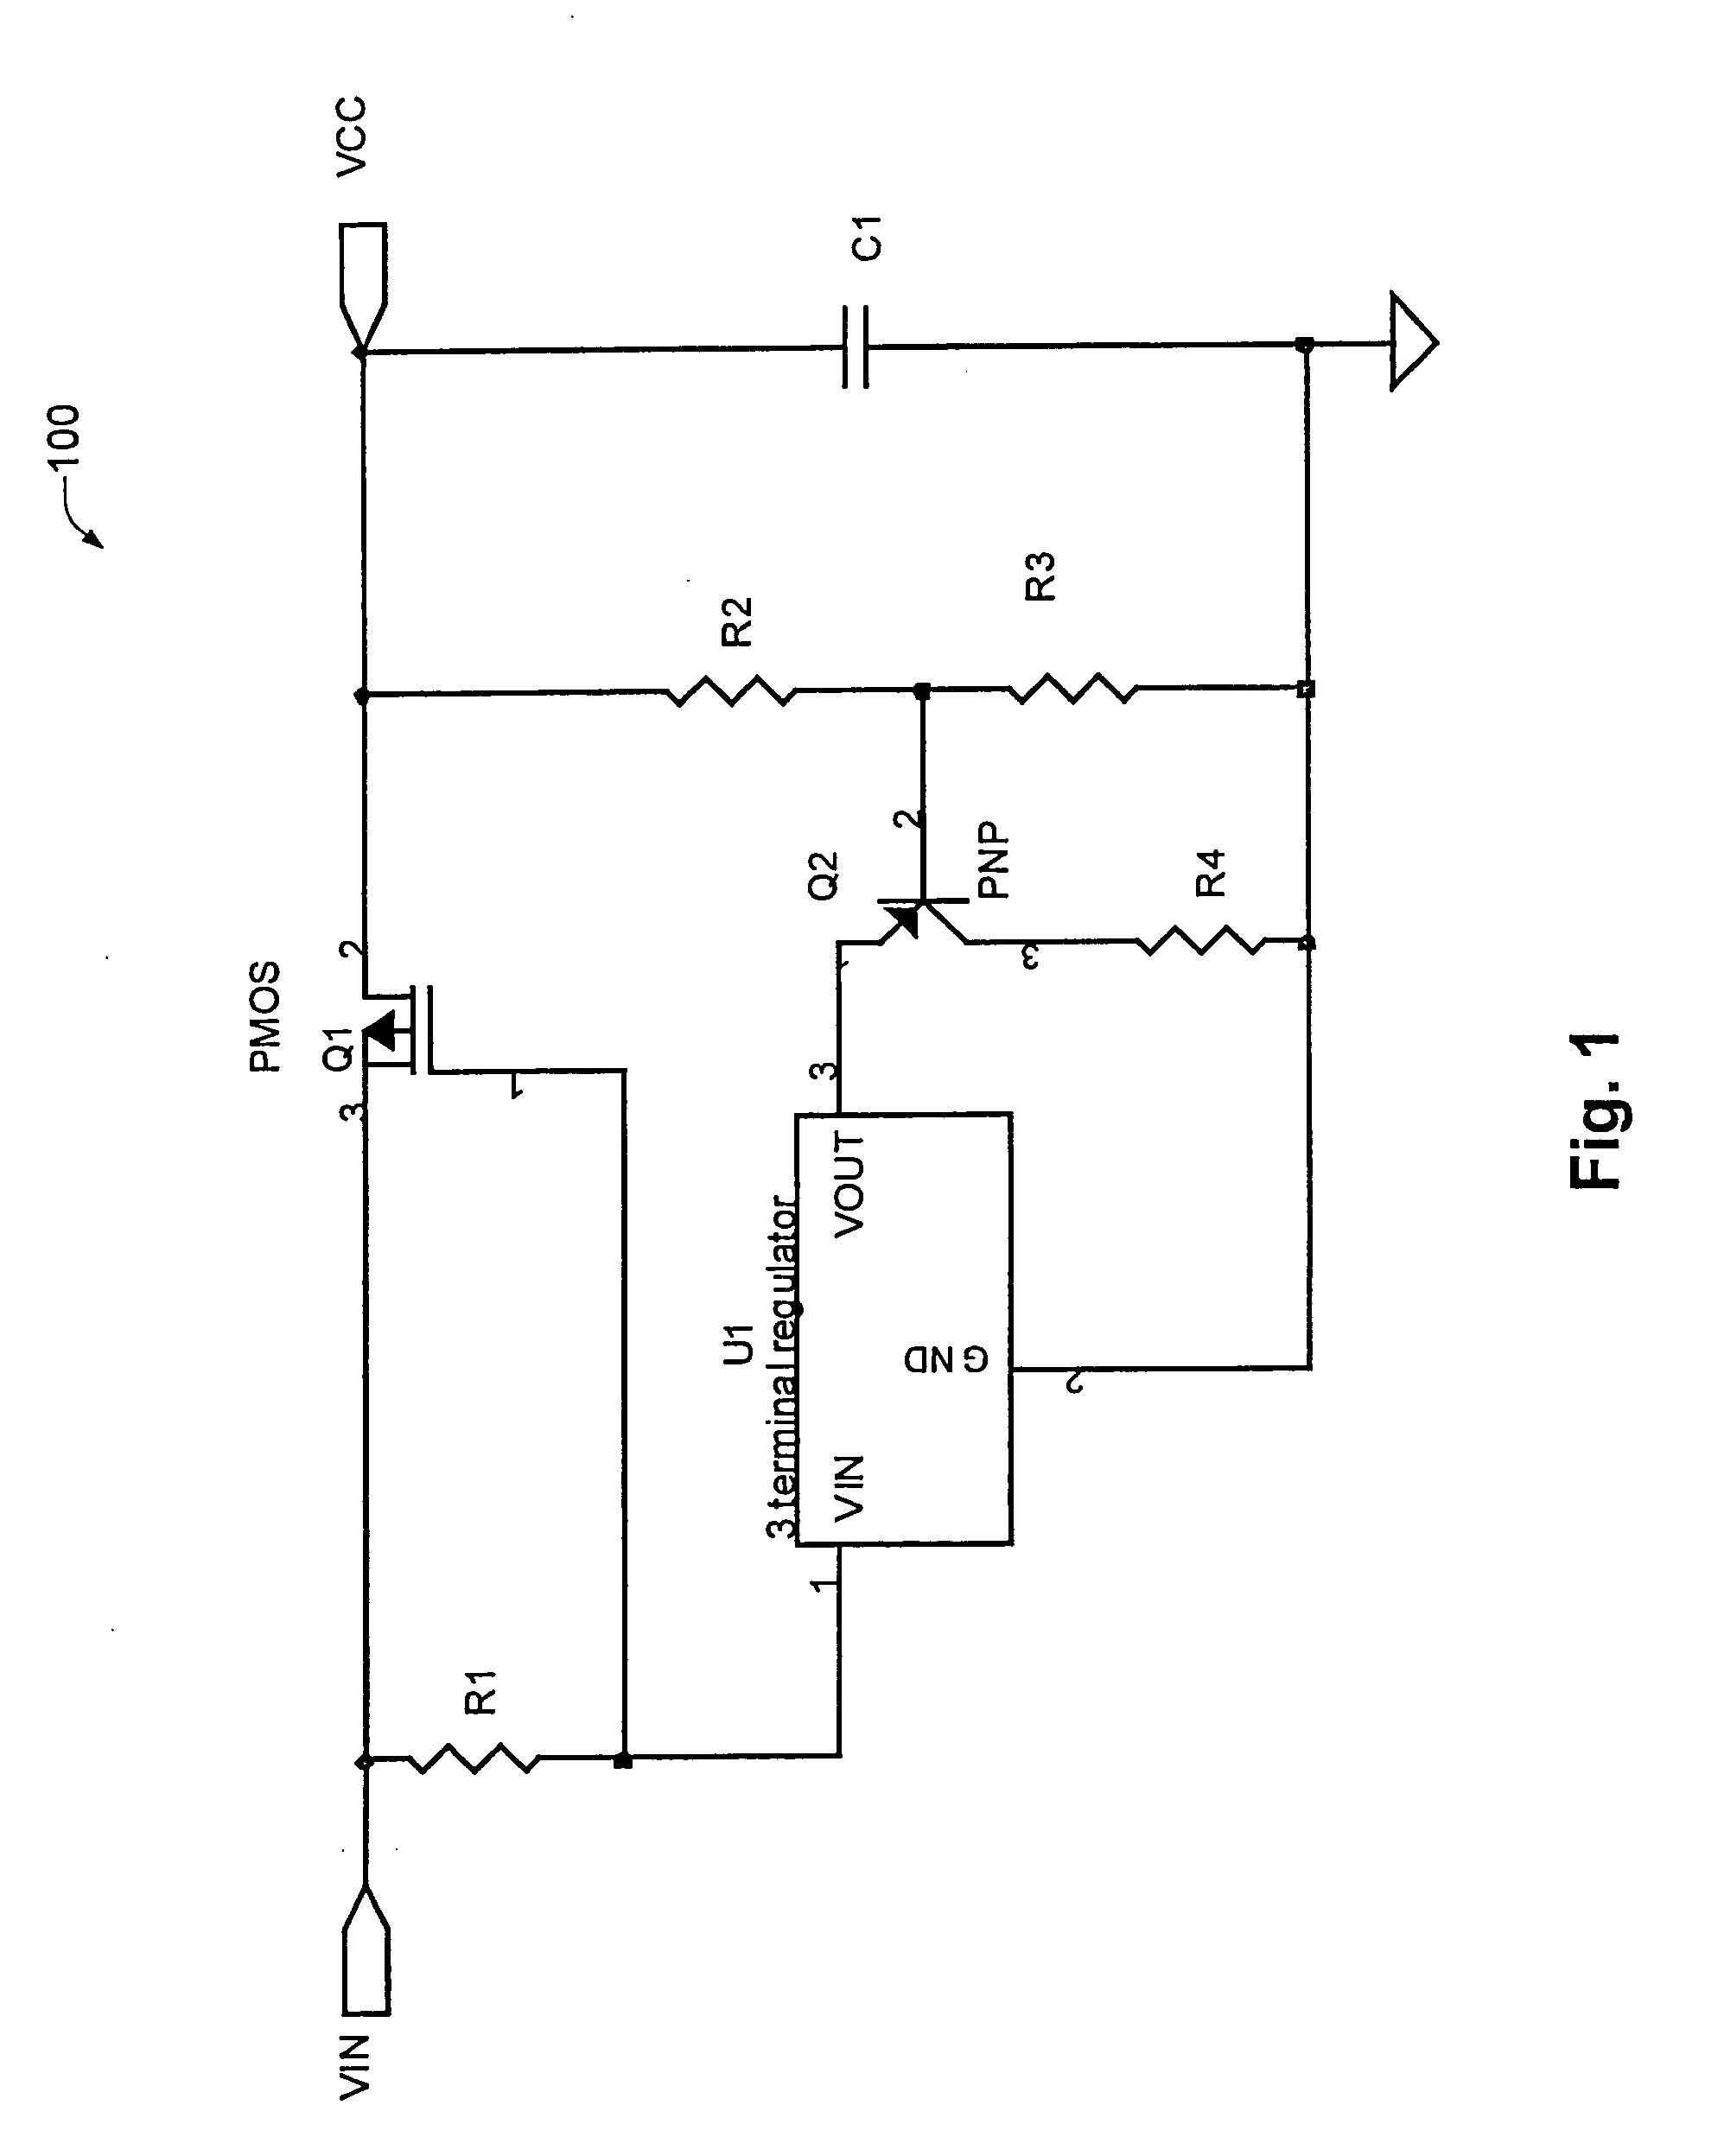 Patent Us6940703 Overvoltage Protection Circuit Google Patents More Mosfet Circuits Voltage Regulators Regulator Drawing